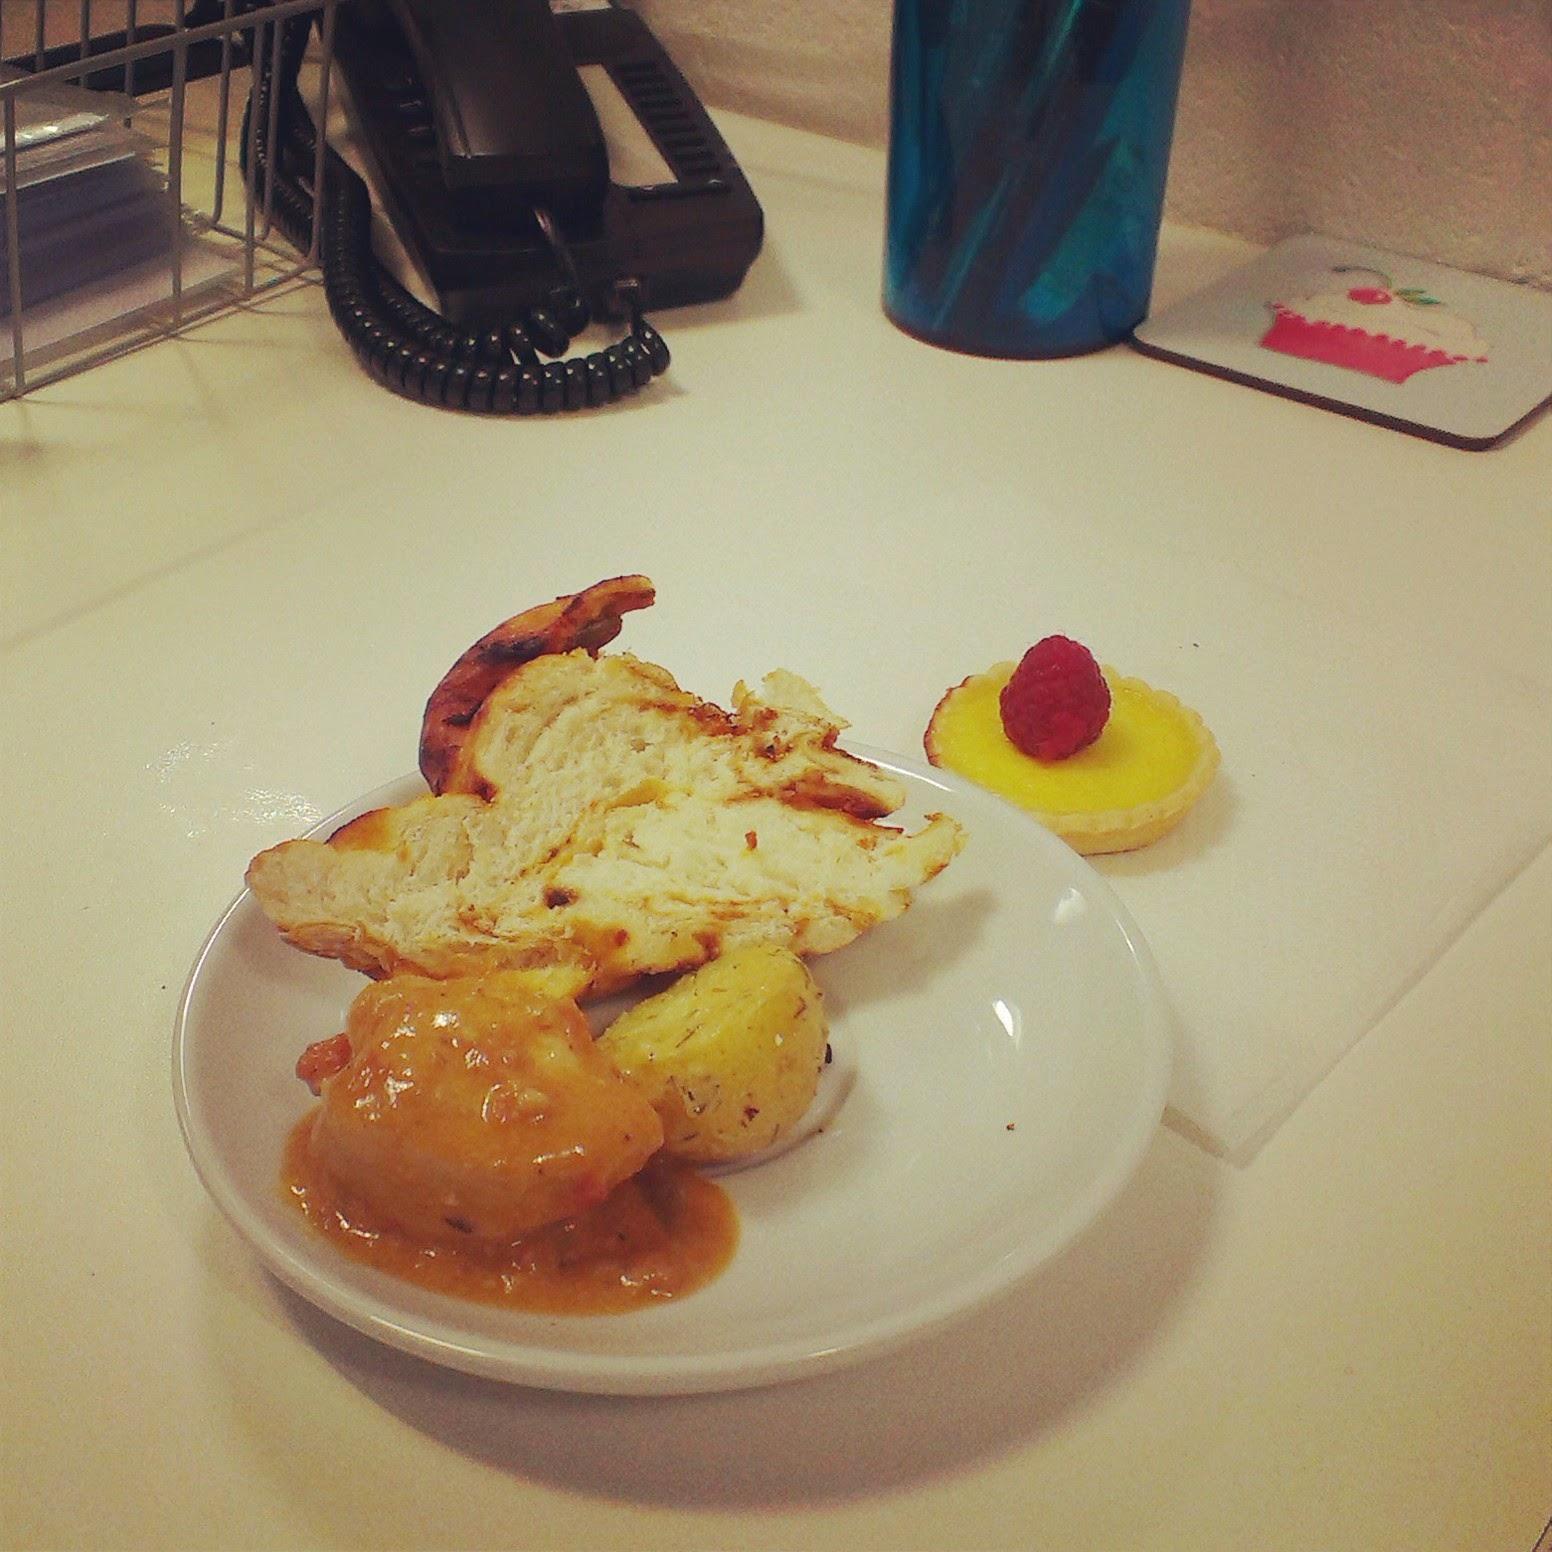 Free food at work